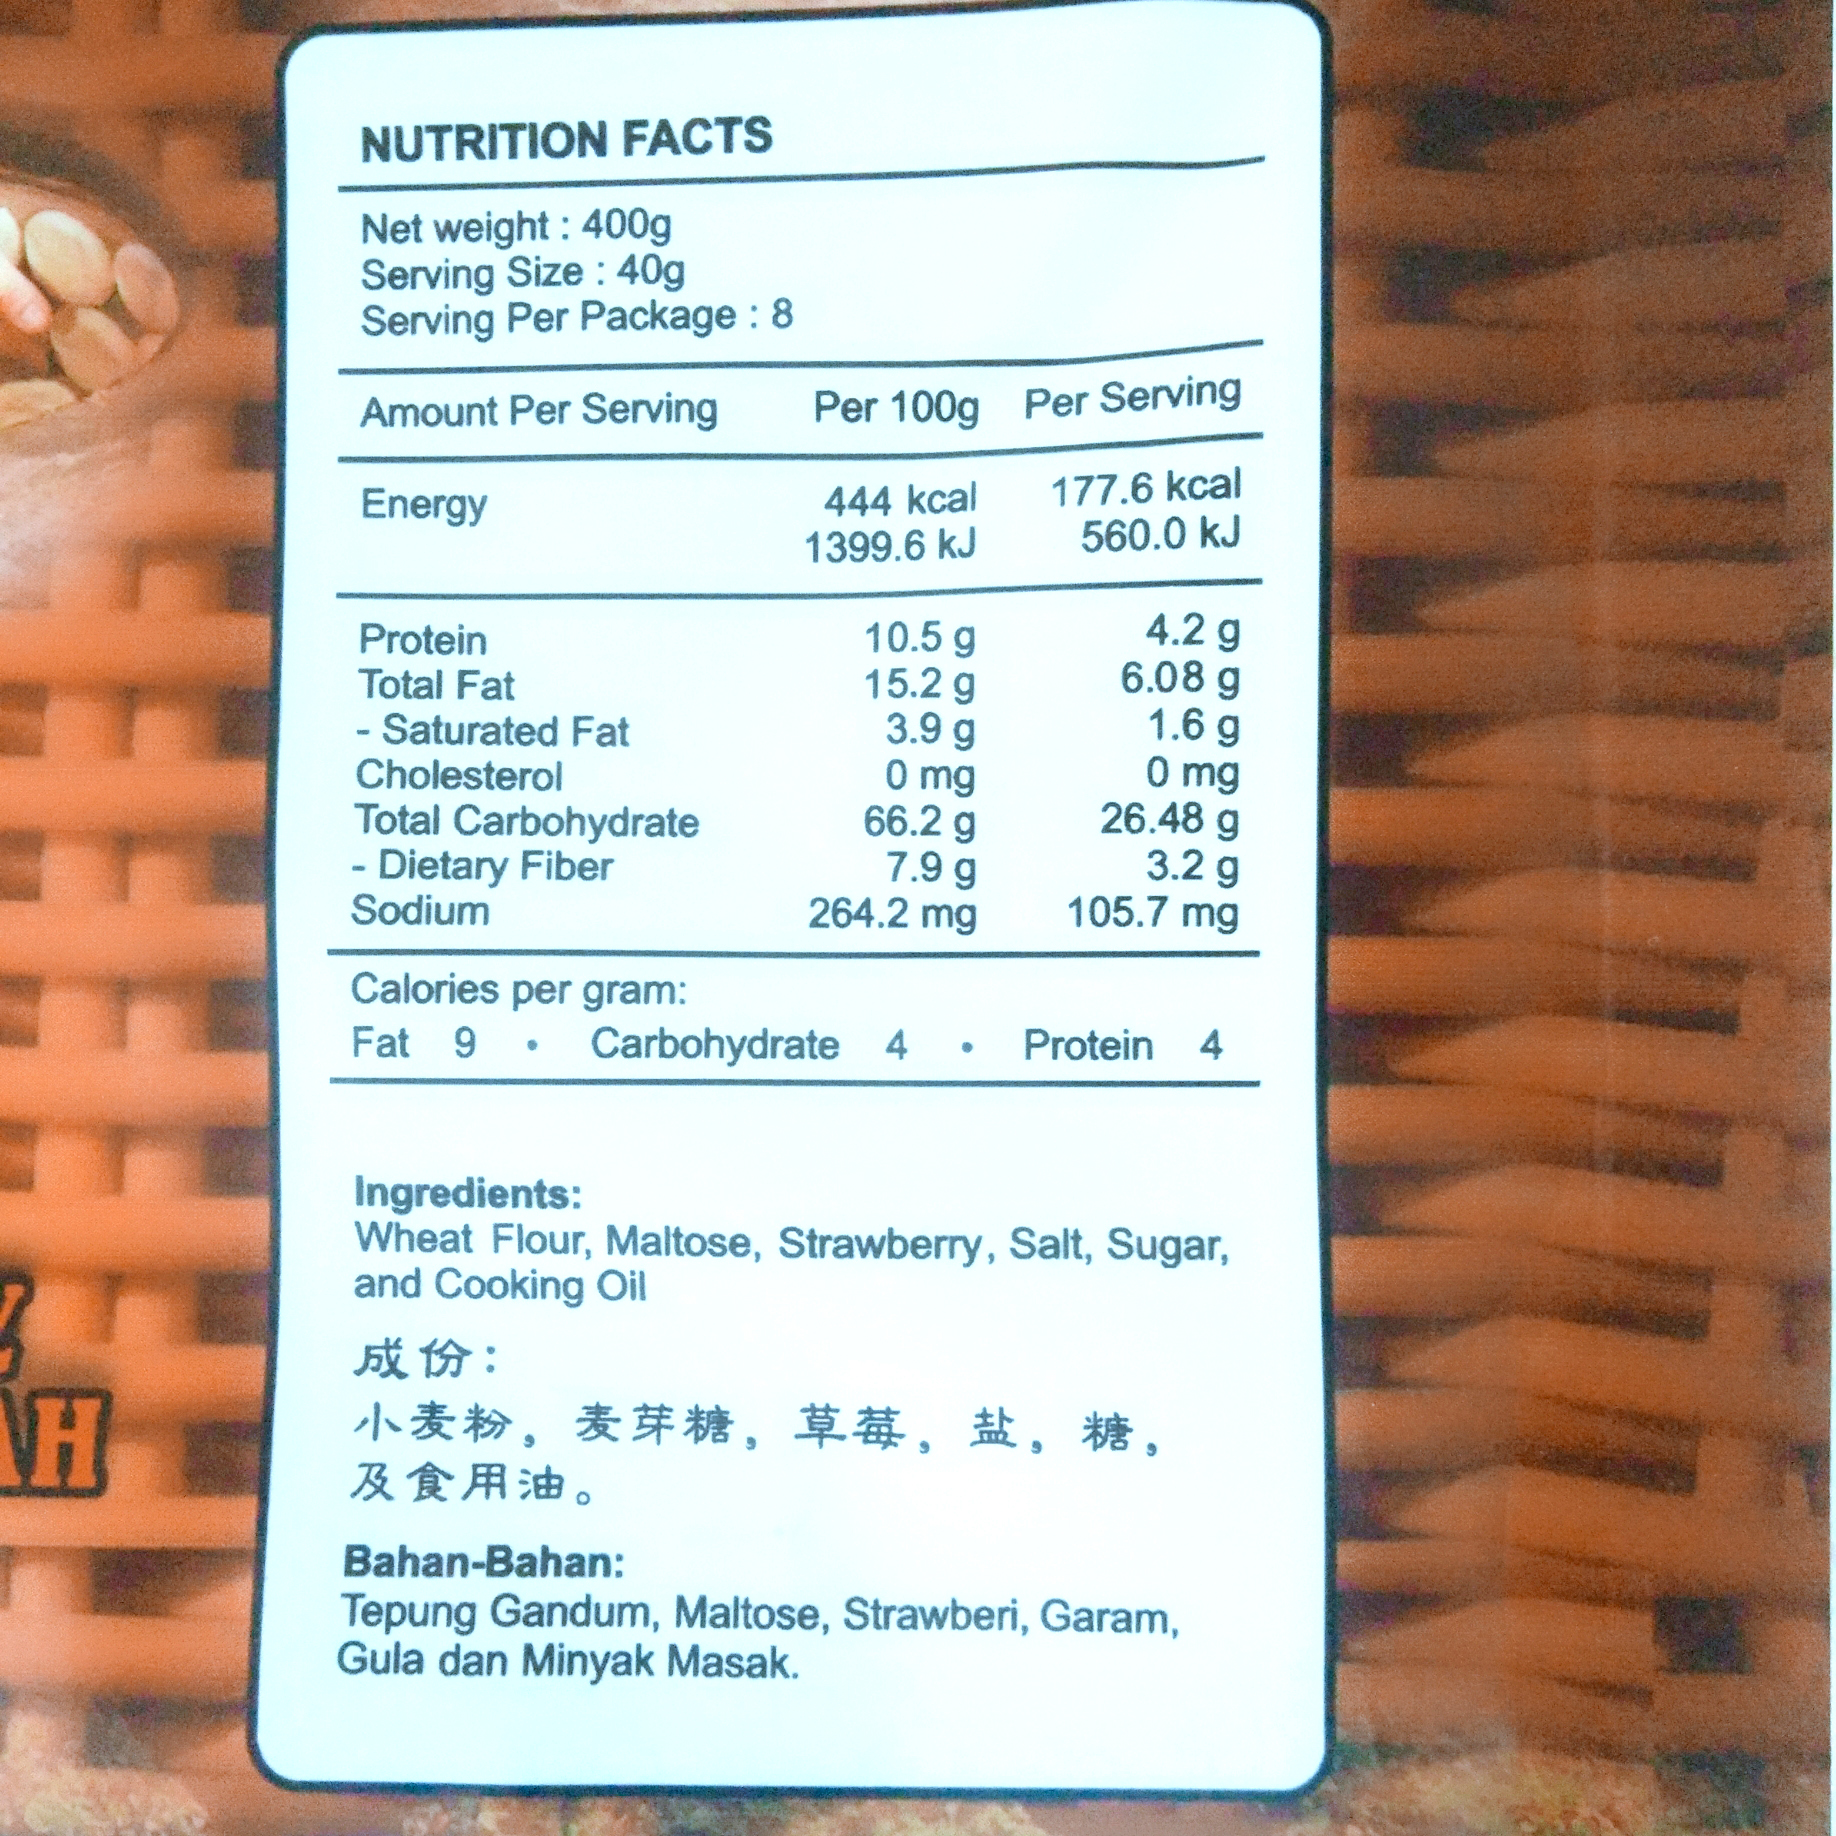 Image Strawberry Heongpeah 回味 - 金马伦草莓香饼 (8粒)400grams